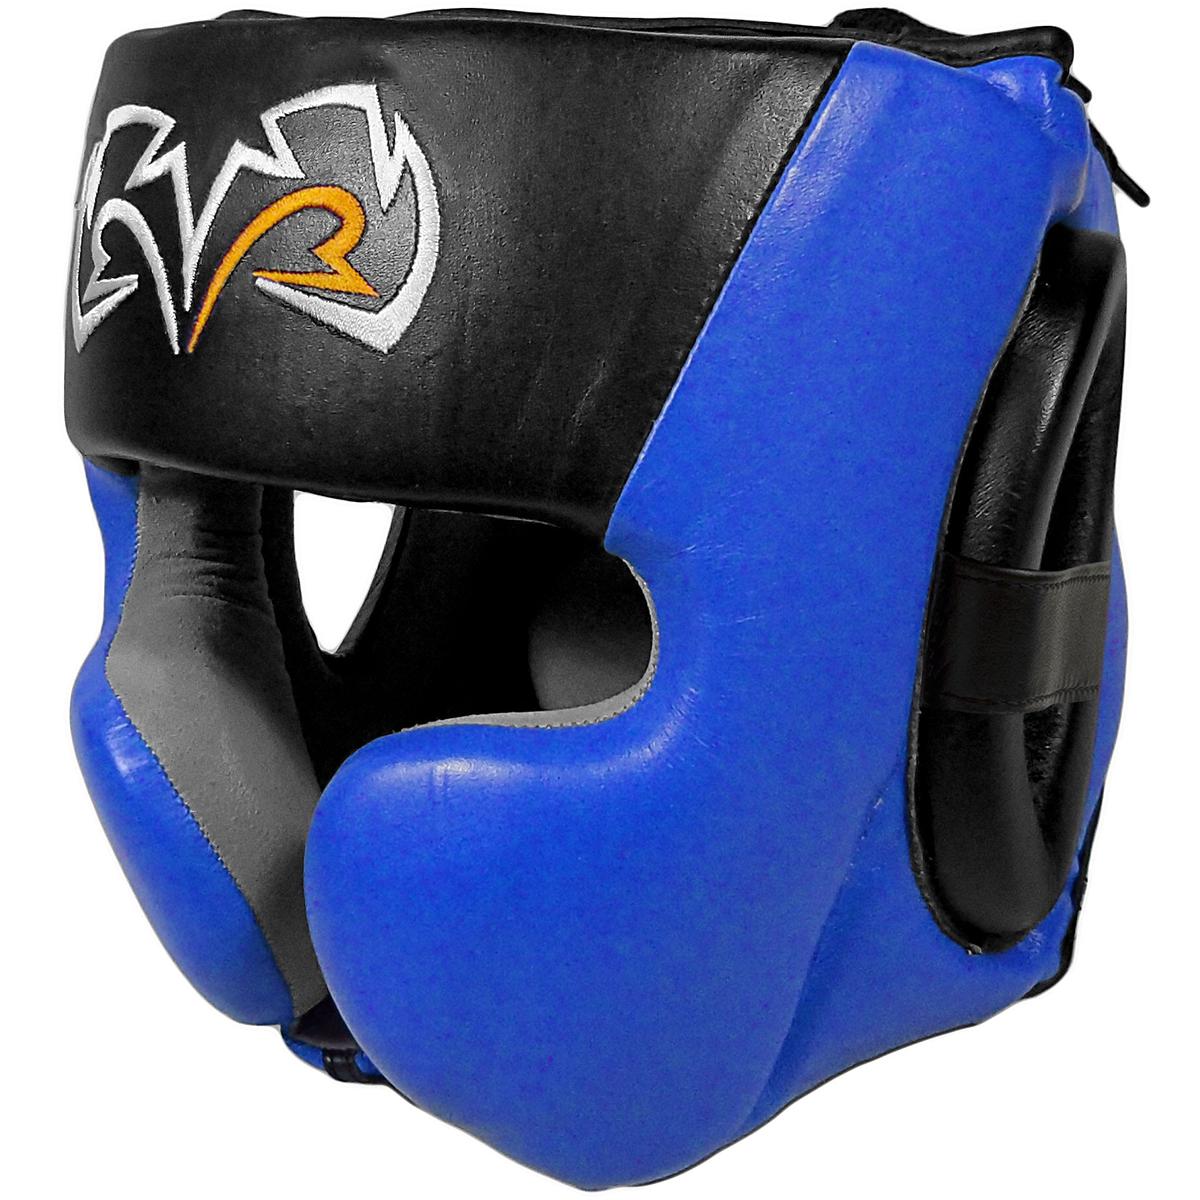 thumbnail 3 - RIVAL Boxing RHG30 Mexican Training Headgear